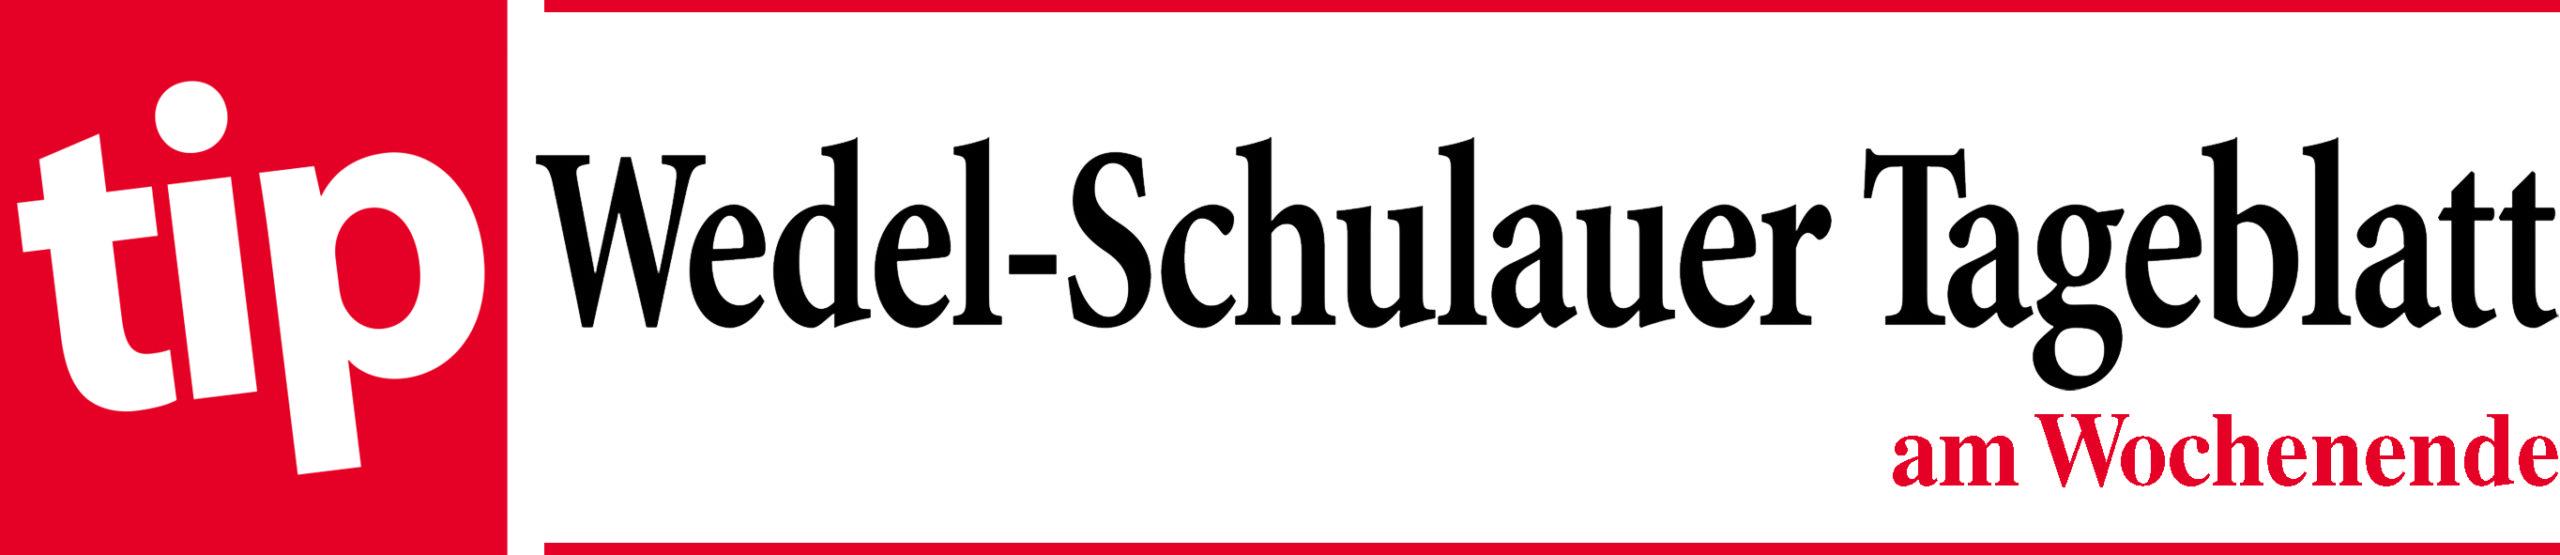 tip_Wedel_Schulauer_Tageblatt_5sp